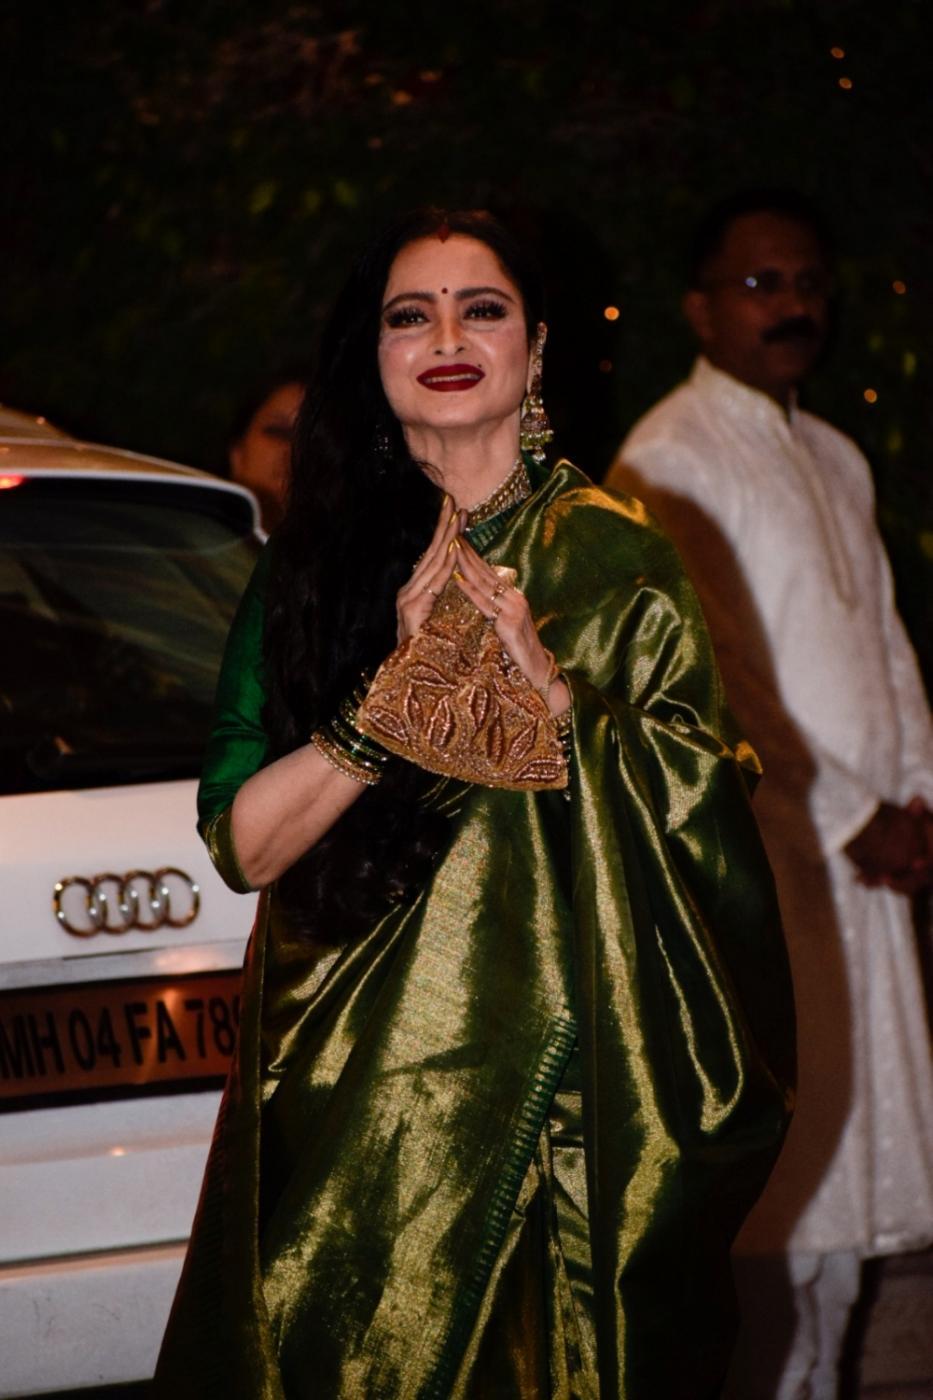 Mumbai: Actress Rekha arrives at Reliance Industries Chairman and MD Mukesh Ambani's residence to celebrate Ganesh Chaturthi in Mumbai on Sept 13, 2018. (Photo: IANS) by .